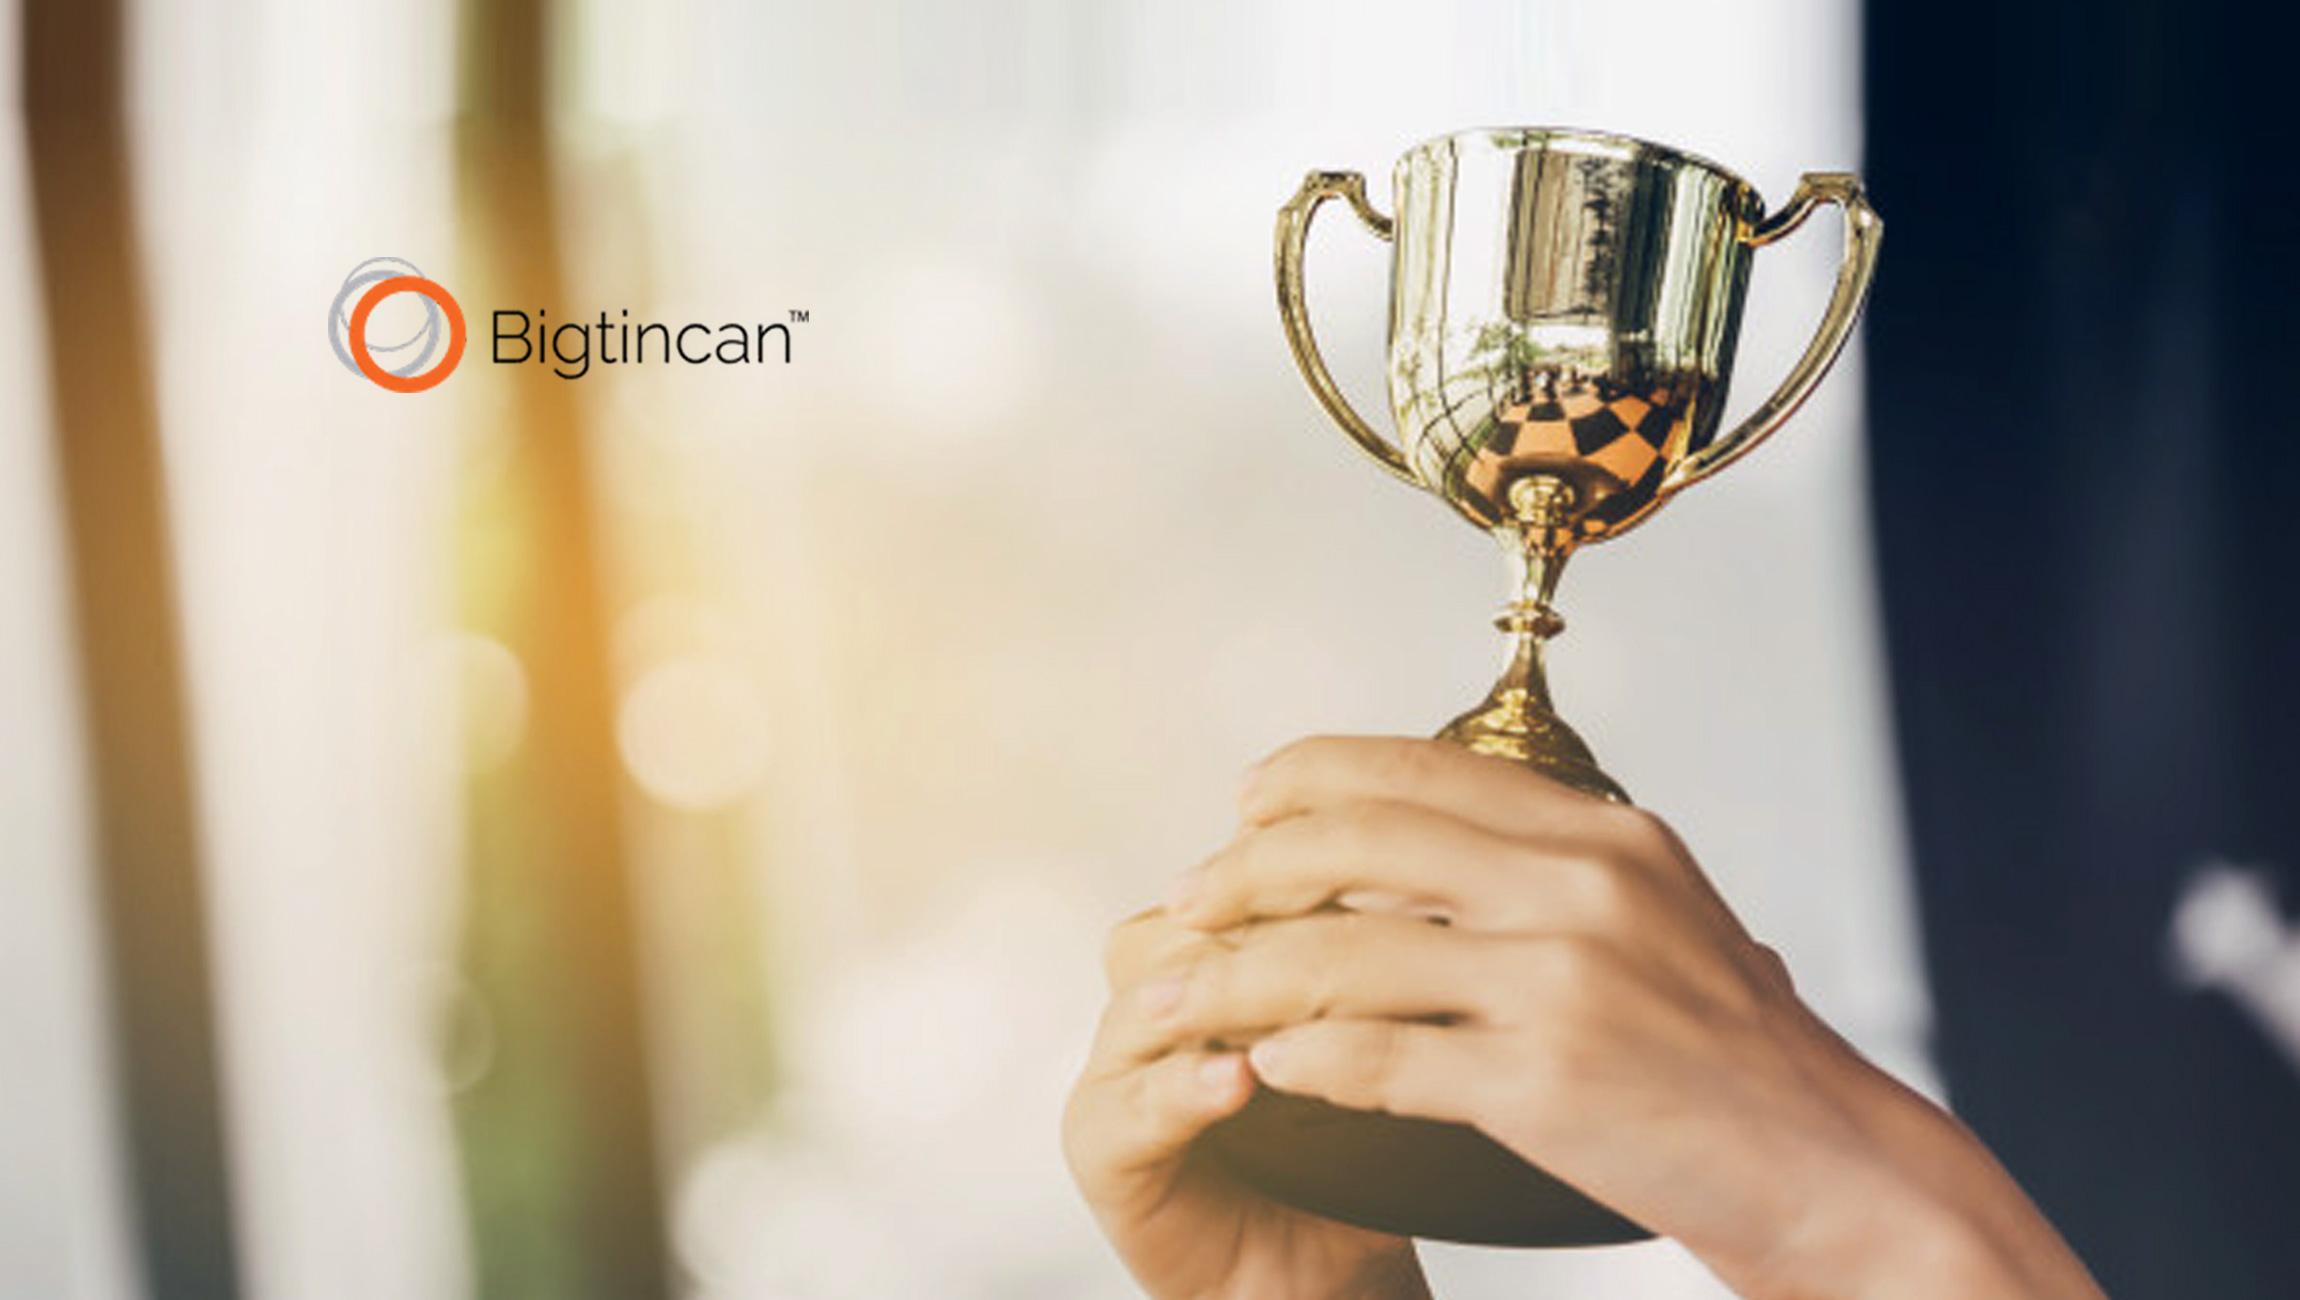 Bigtincan Wins Bronze Stevie Award in 2019 Stevie Awards for Sales & Customer Service